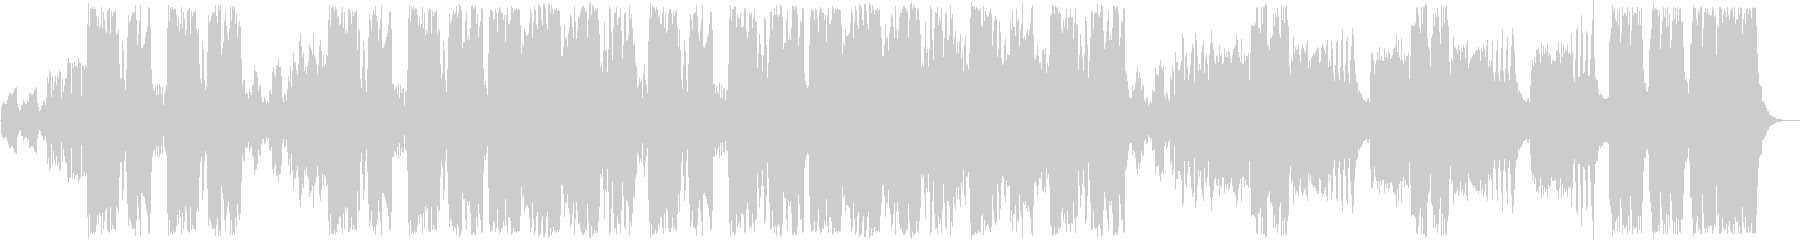 Marriage march / Mendelssohn's unreproduced waveform